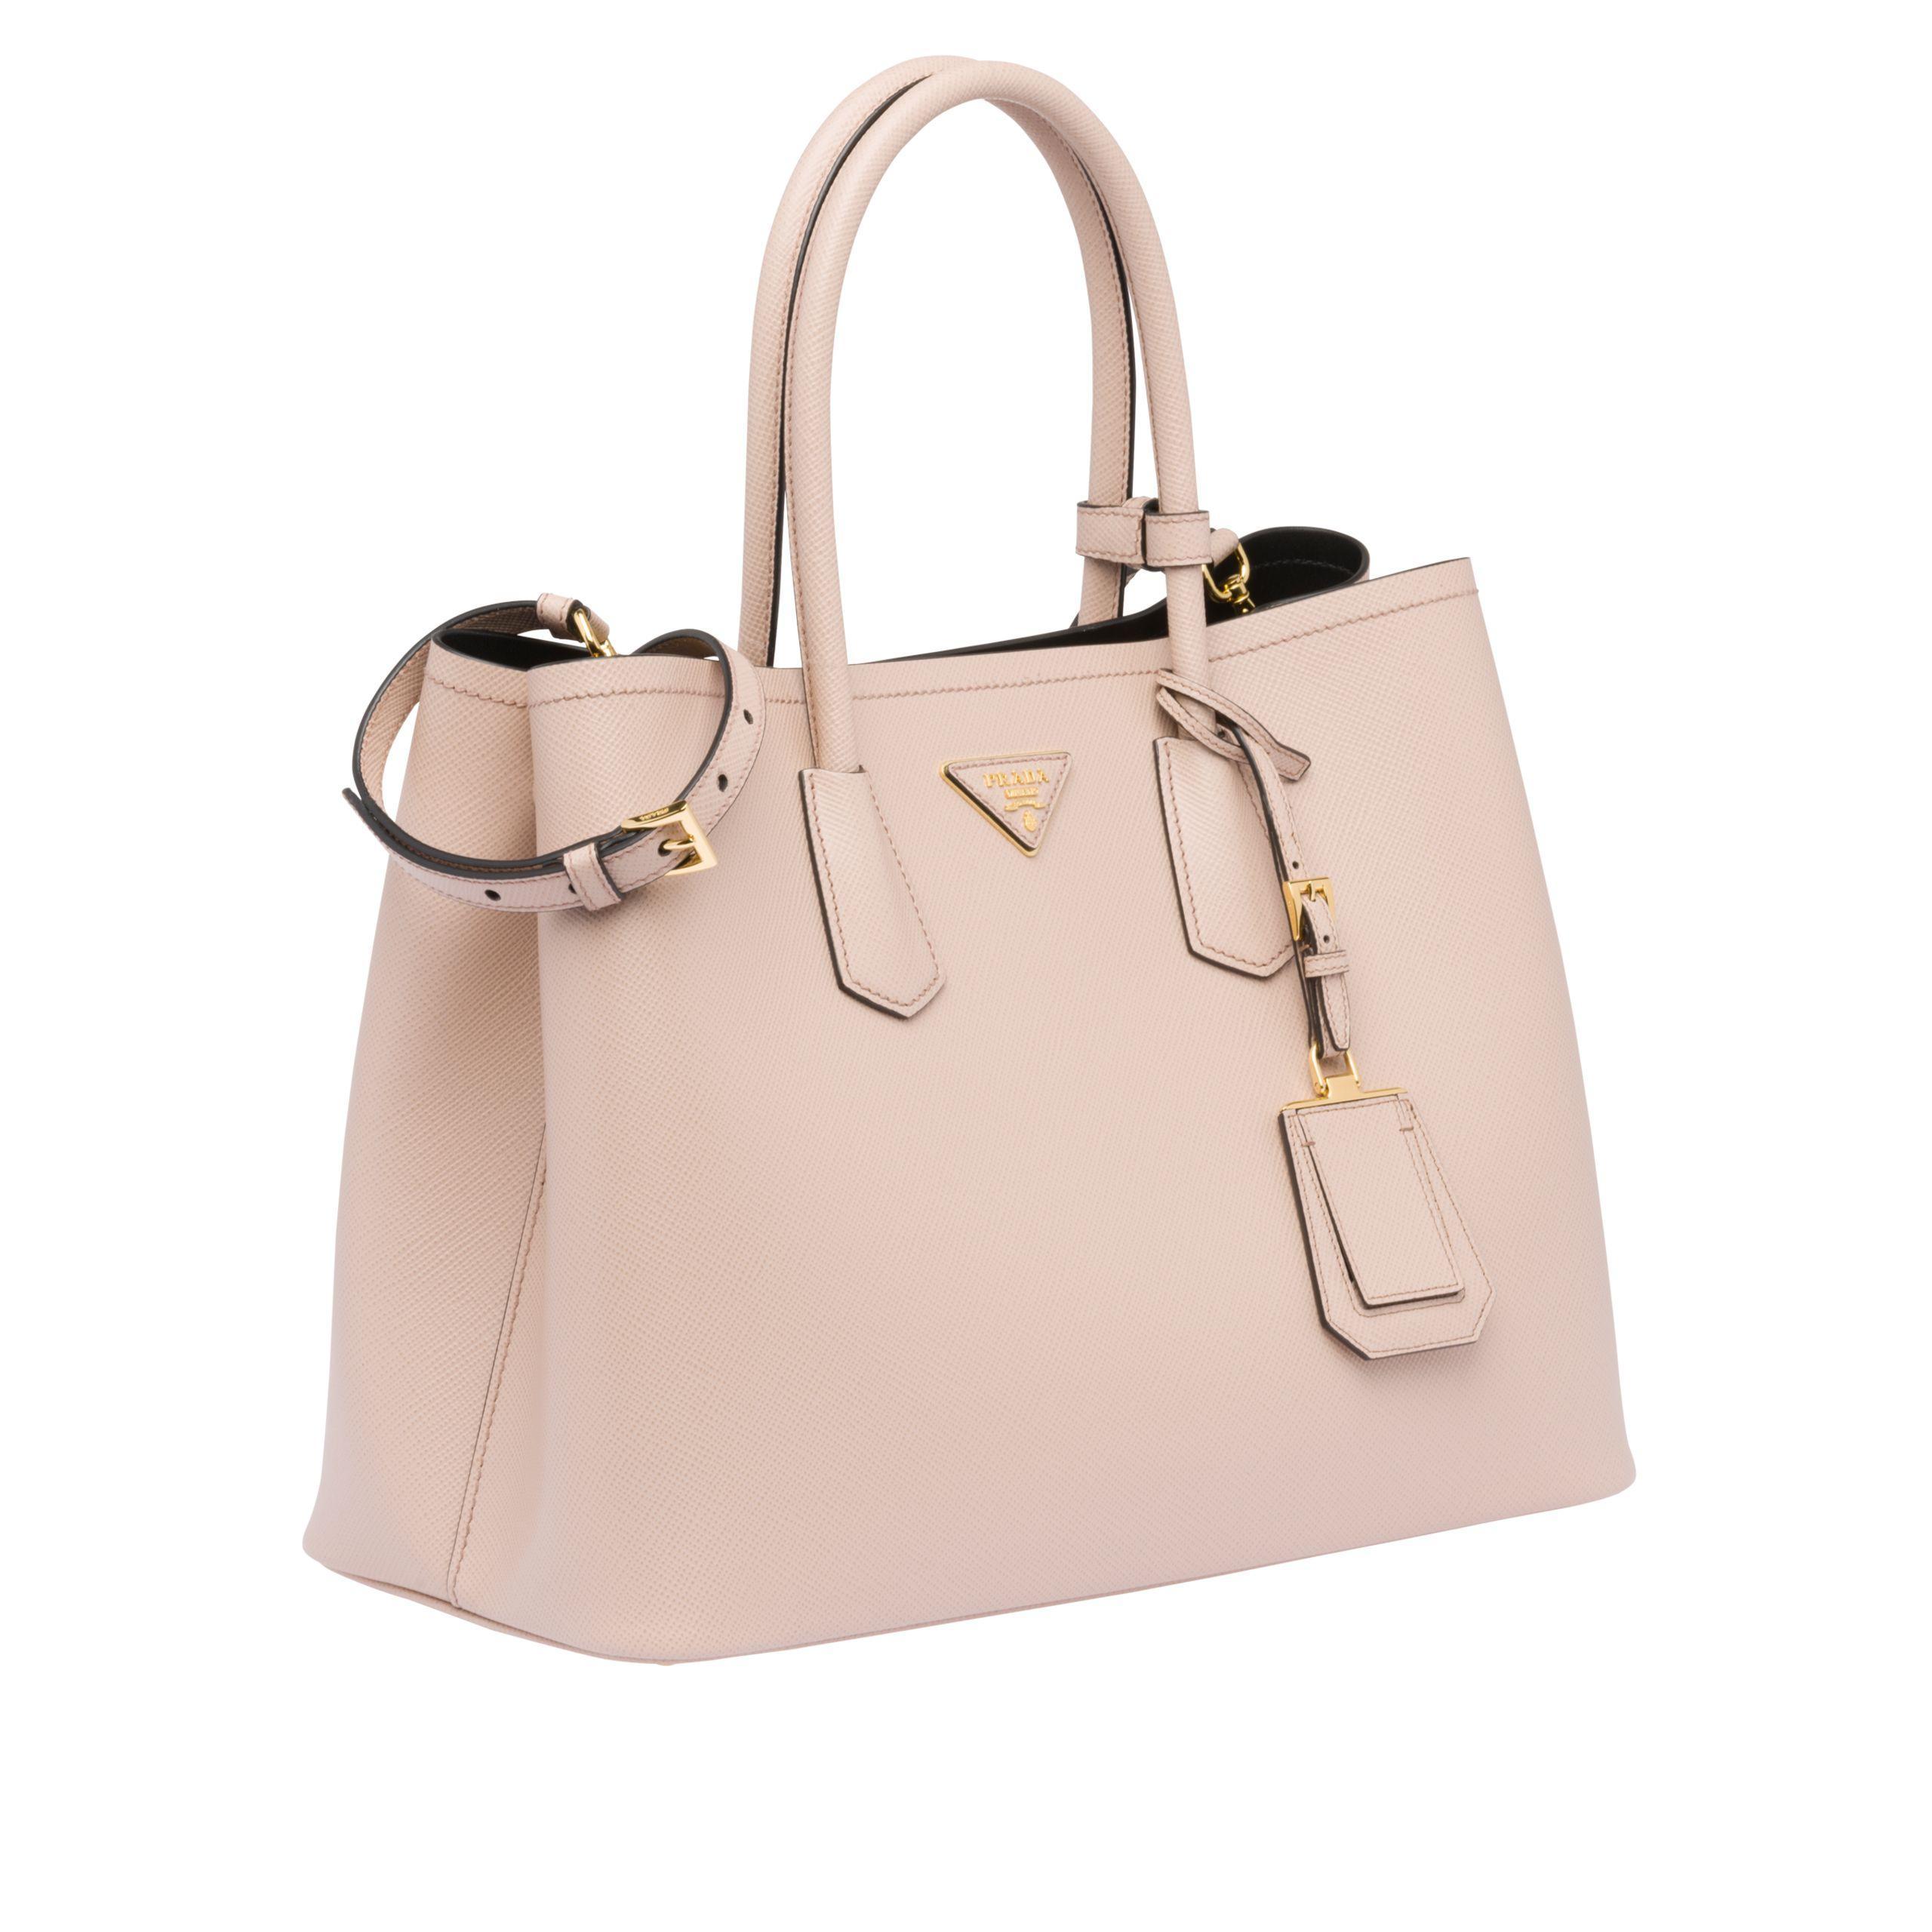 420e8a846eab Prada - Natural Double Bag Large - Lyst. View fullscreen